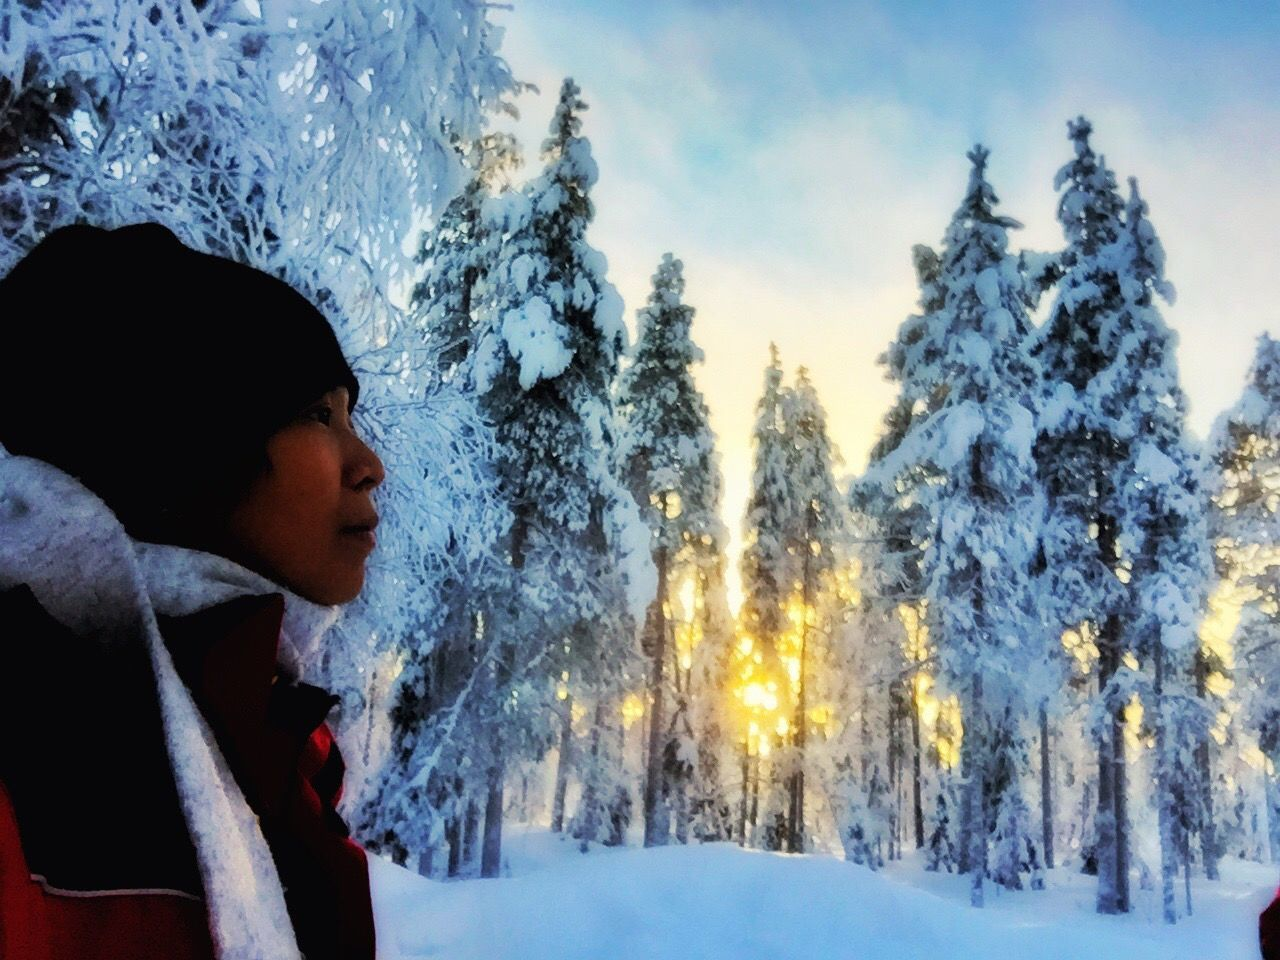 Showcase: February Aurora Chasing Sojourn IntotheArticCircle Rovaniemi, Finland Winterinlaplandfinland Winterinfinland2016 IPS2016Nature Pastel Power LLLimages